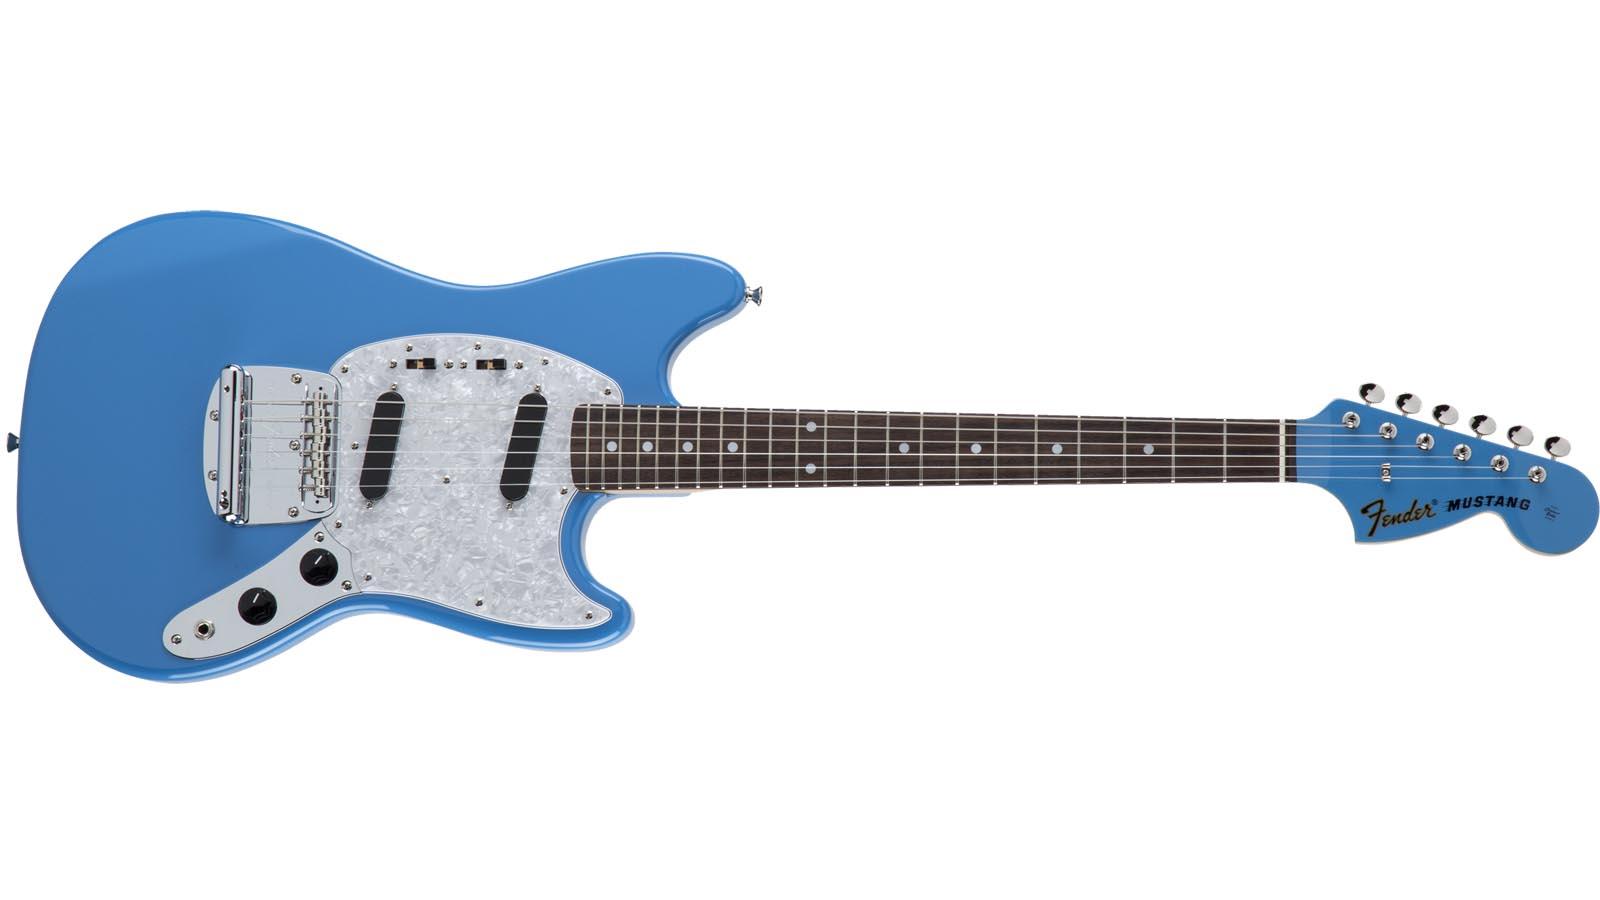 Fender MIJ Traditional 70s Mustang RW CBL